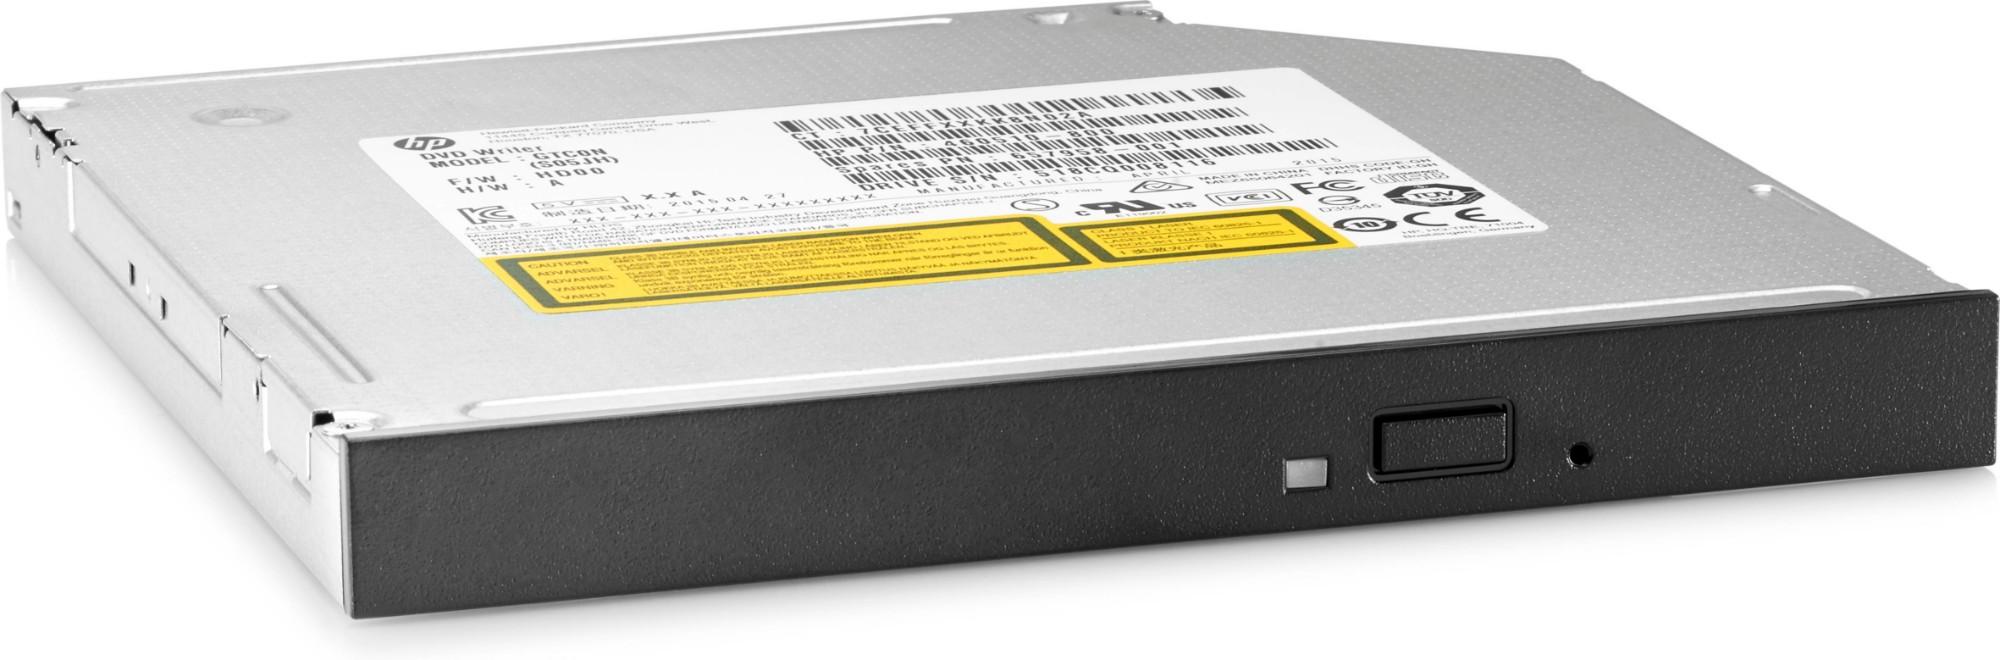 HP 9.5mm AIO 600 G2 Slim DVD-Writer Drive